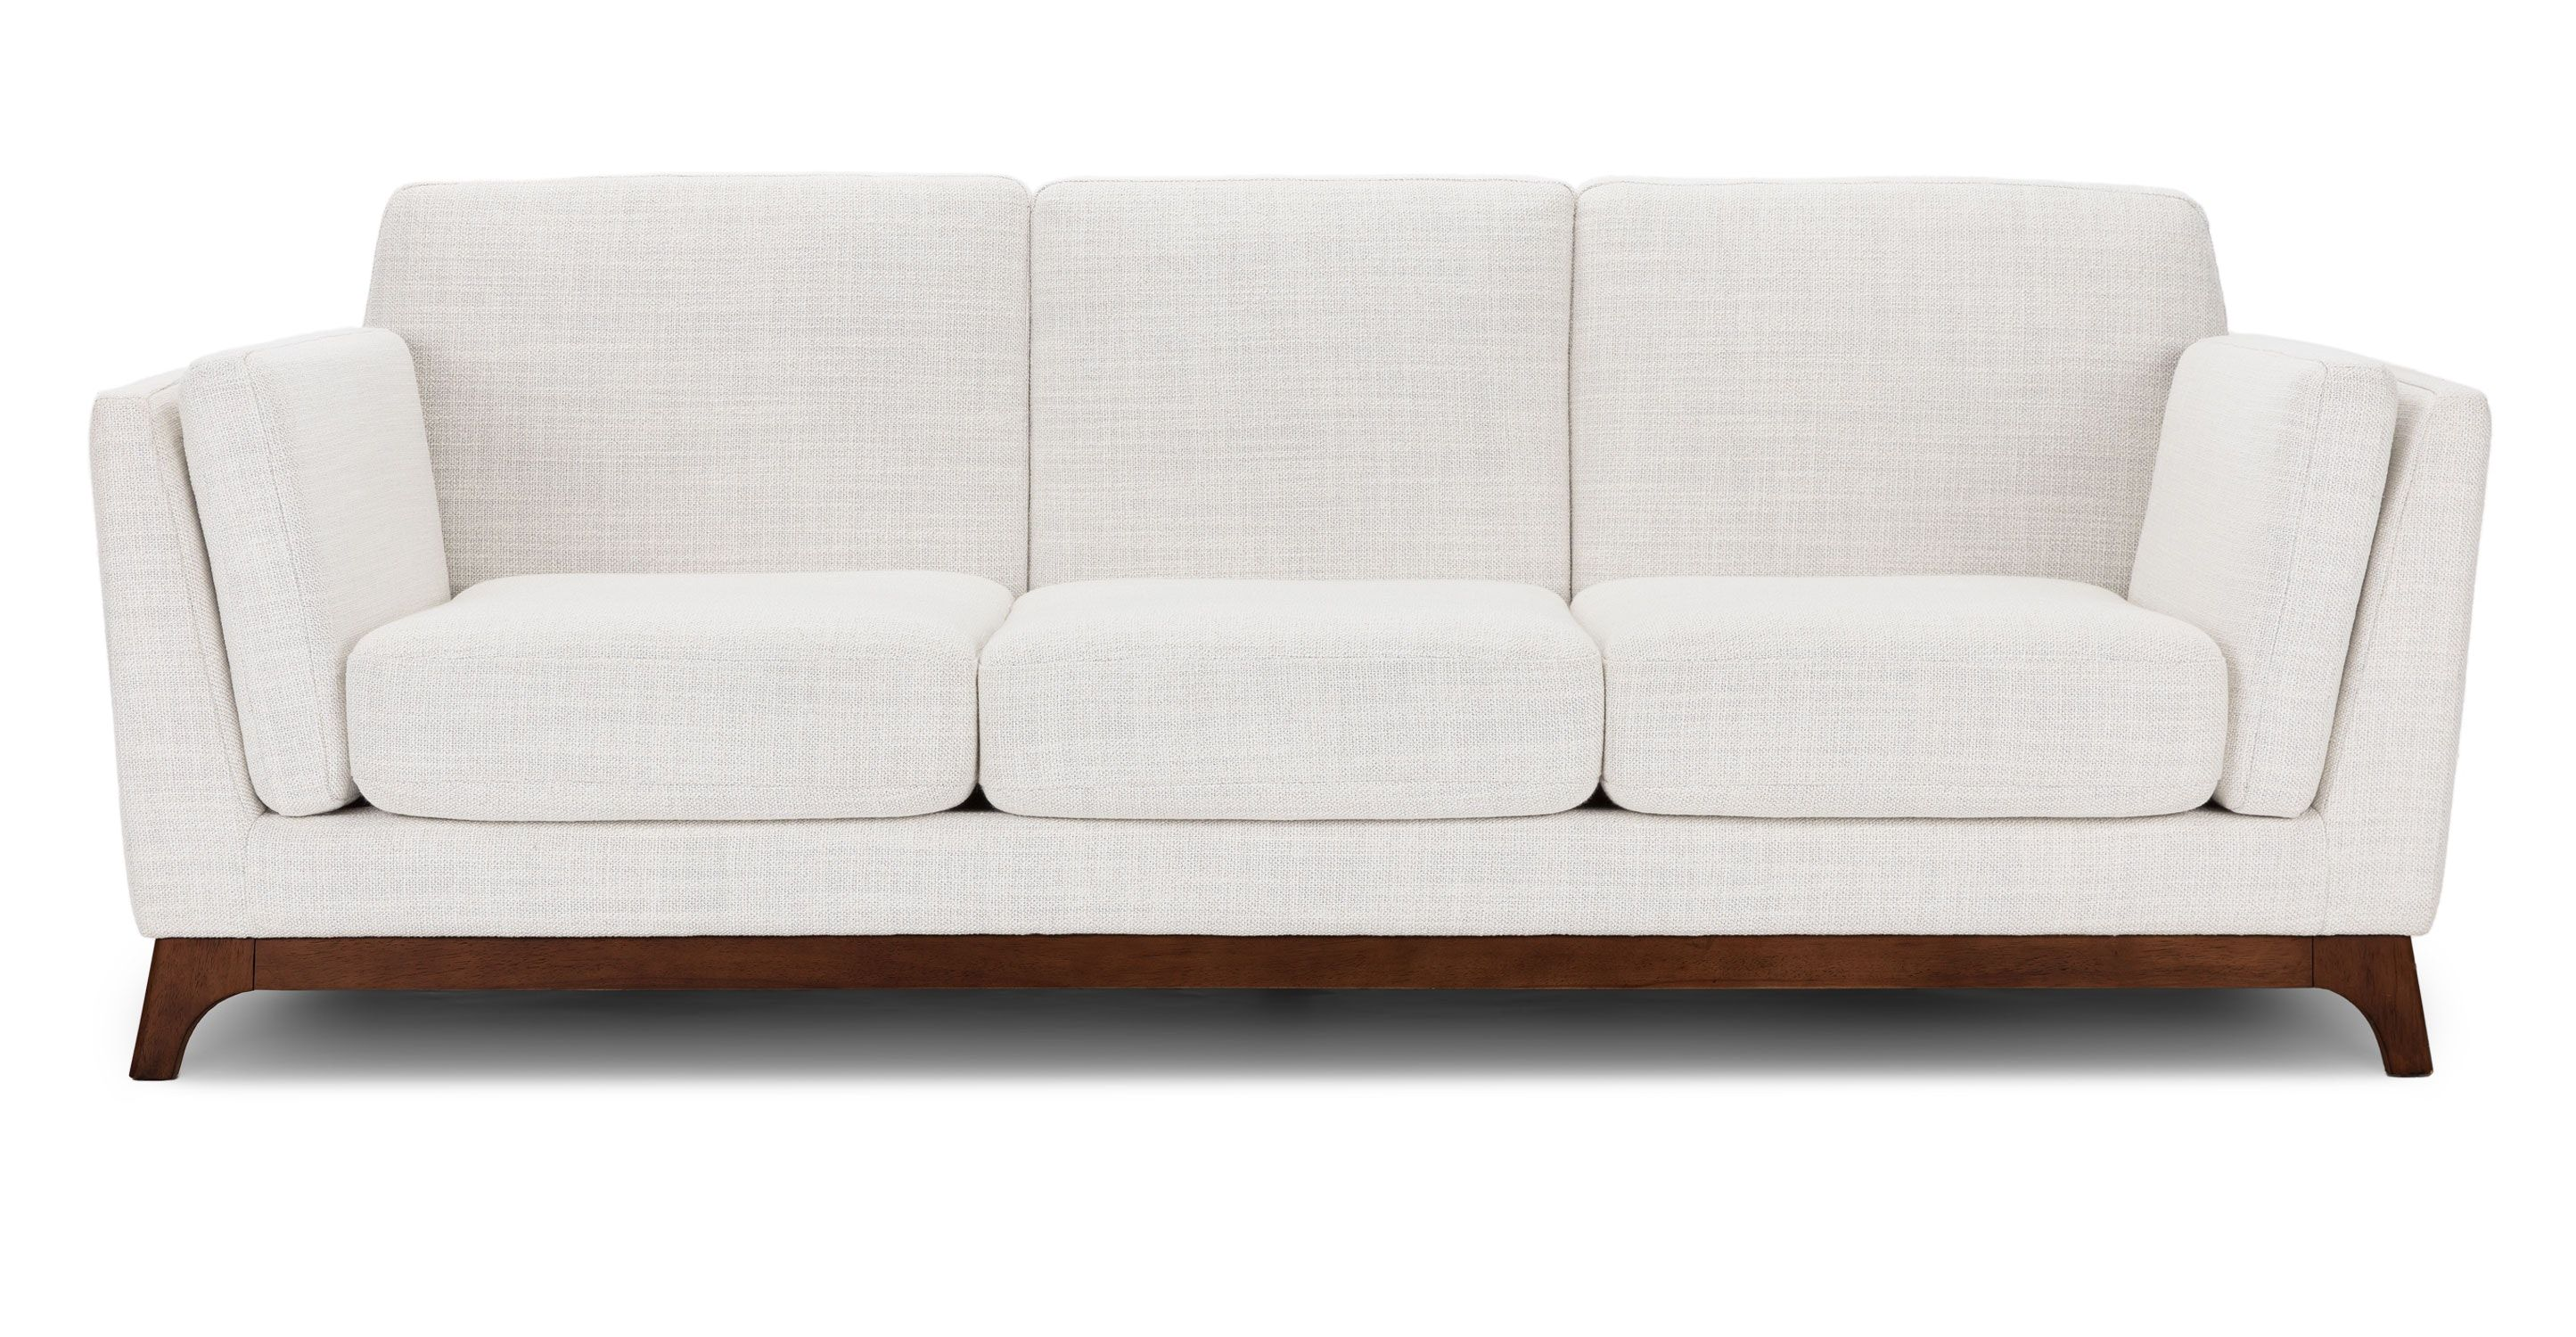 Ceni Fresh White Sofa - Sofas - Article | Modern, Mid-Century and  Scandinavian Furniture